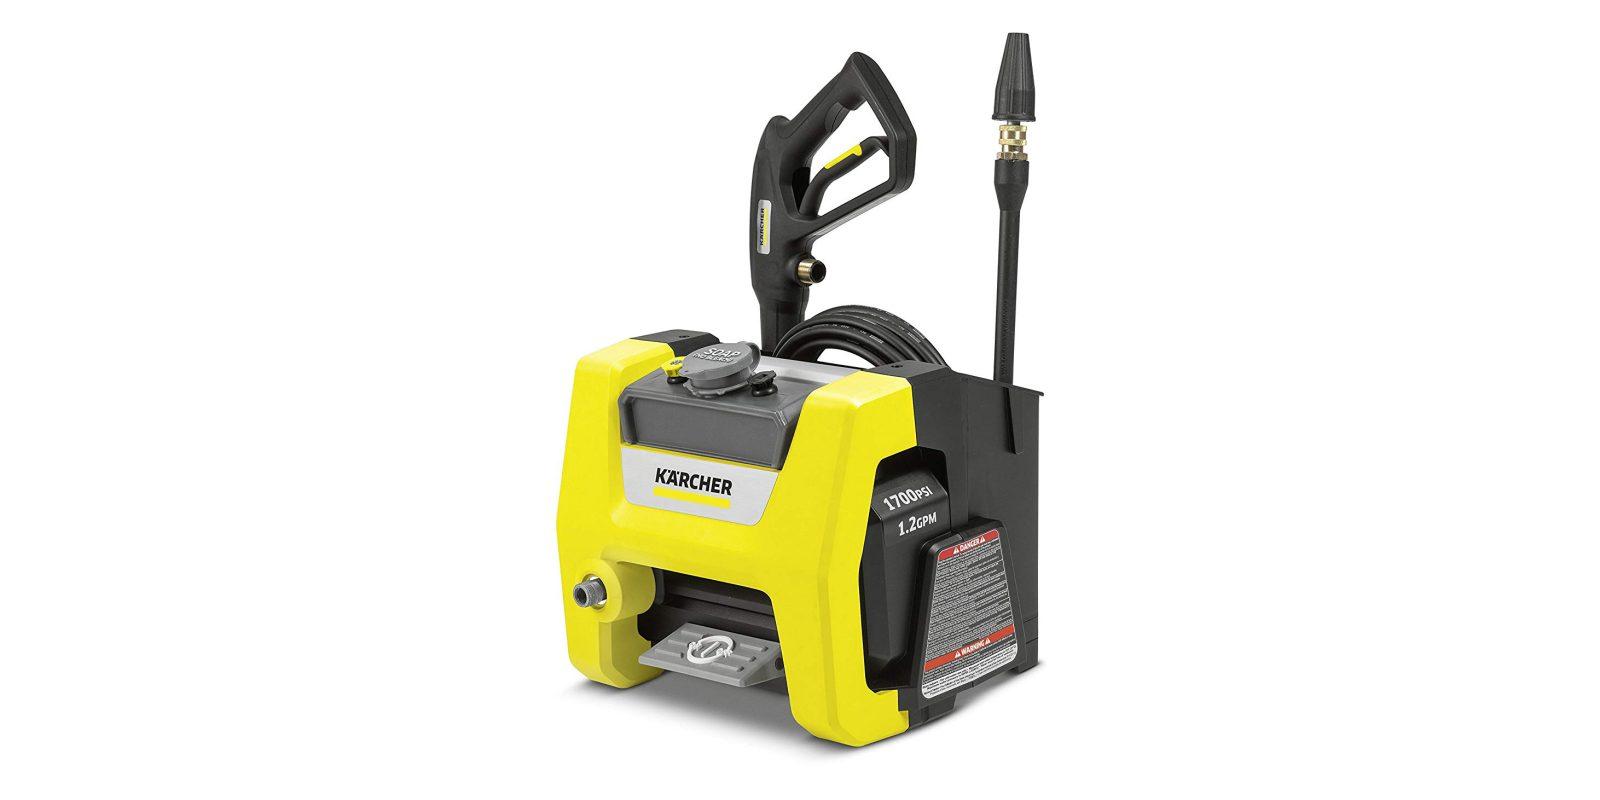 Green Deals: Karcher 1700PSI Electric Pressure Washer $100